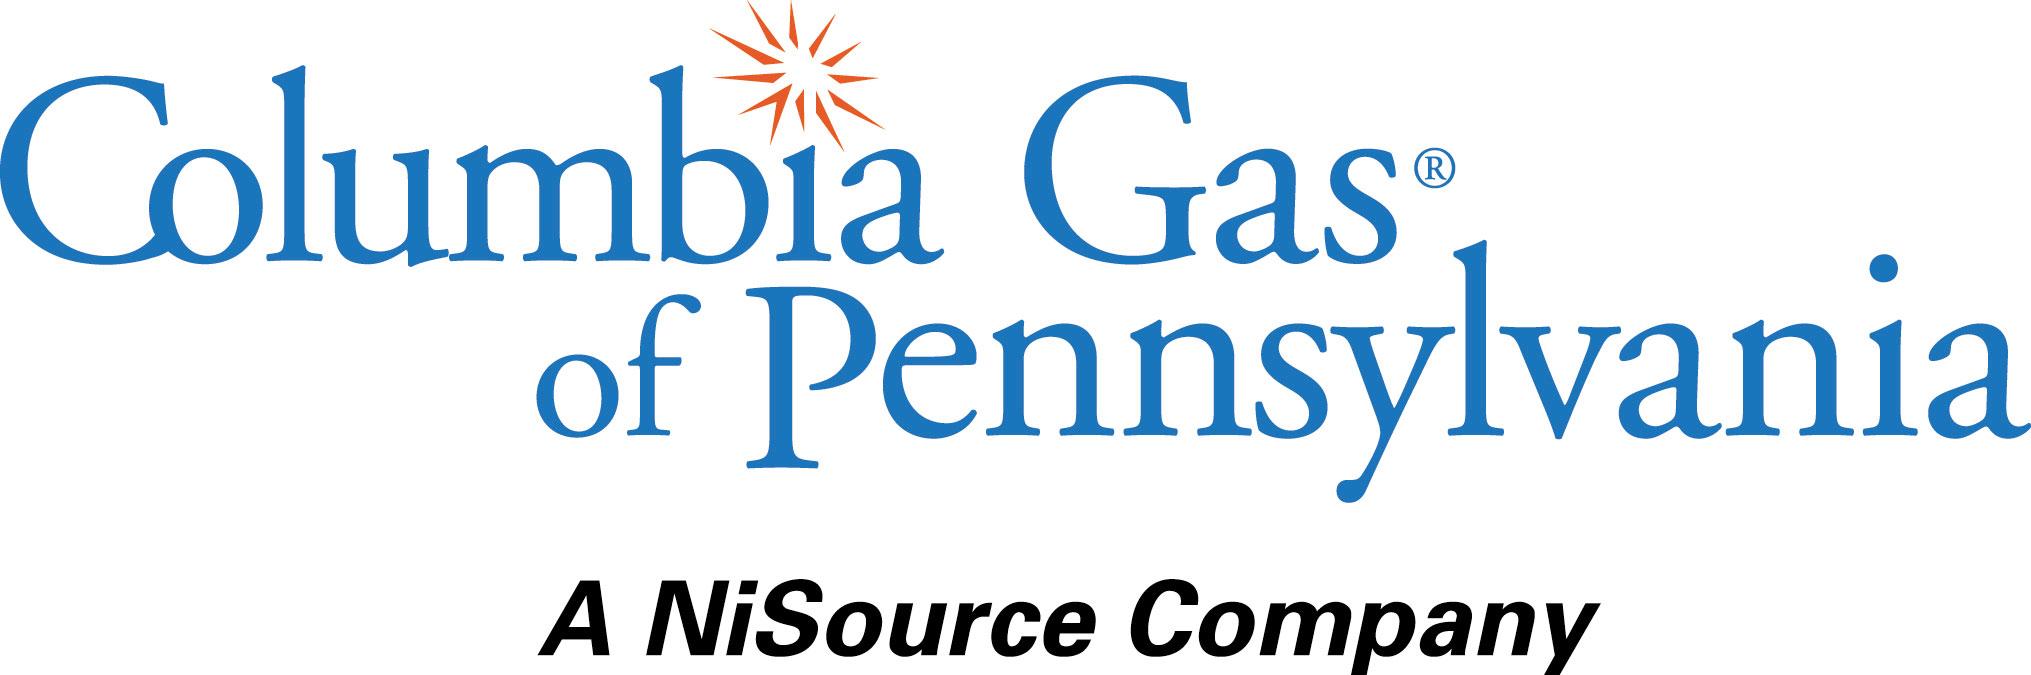 Columbia Gas of Pennsylvania Logo